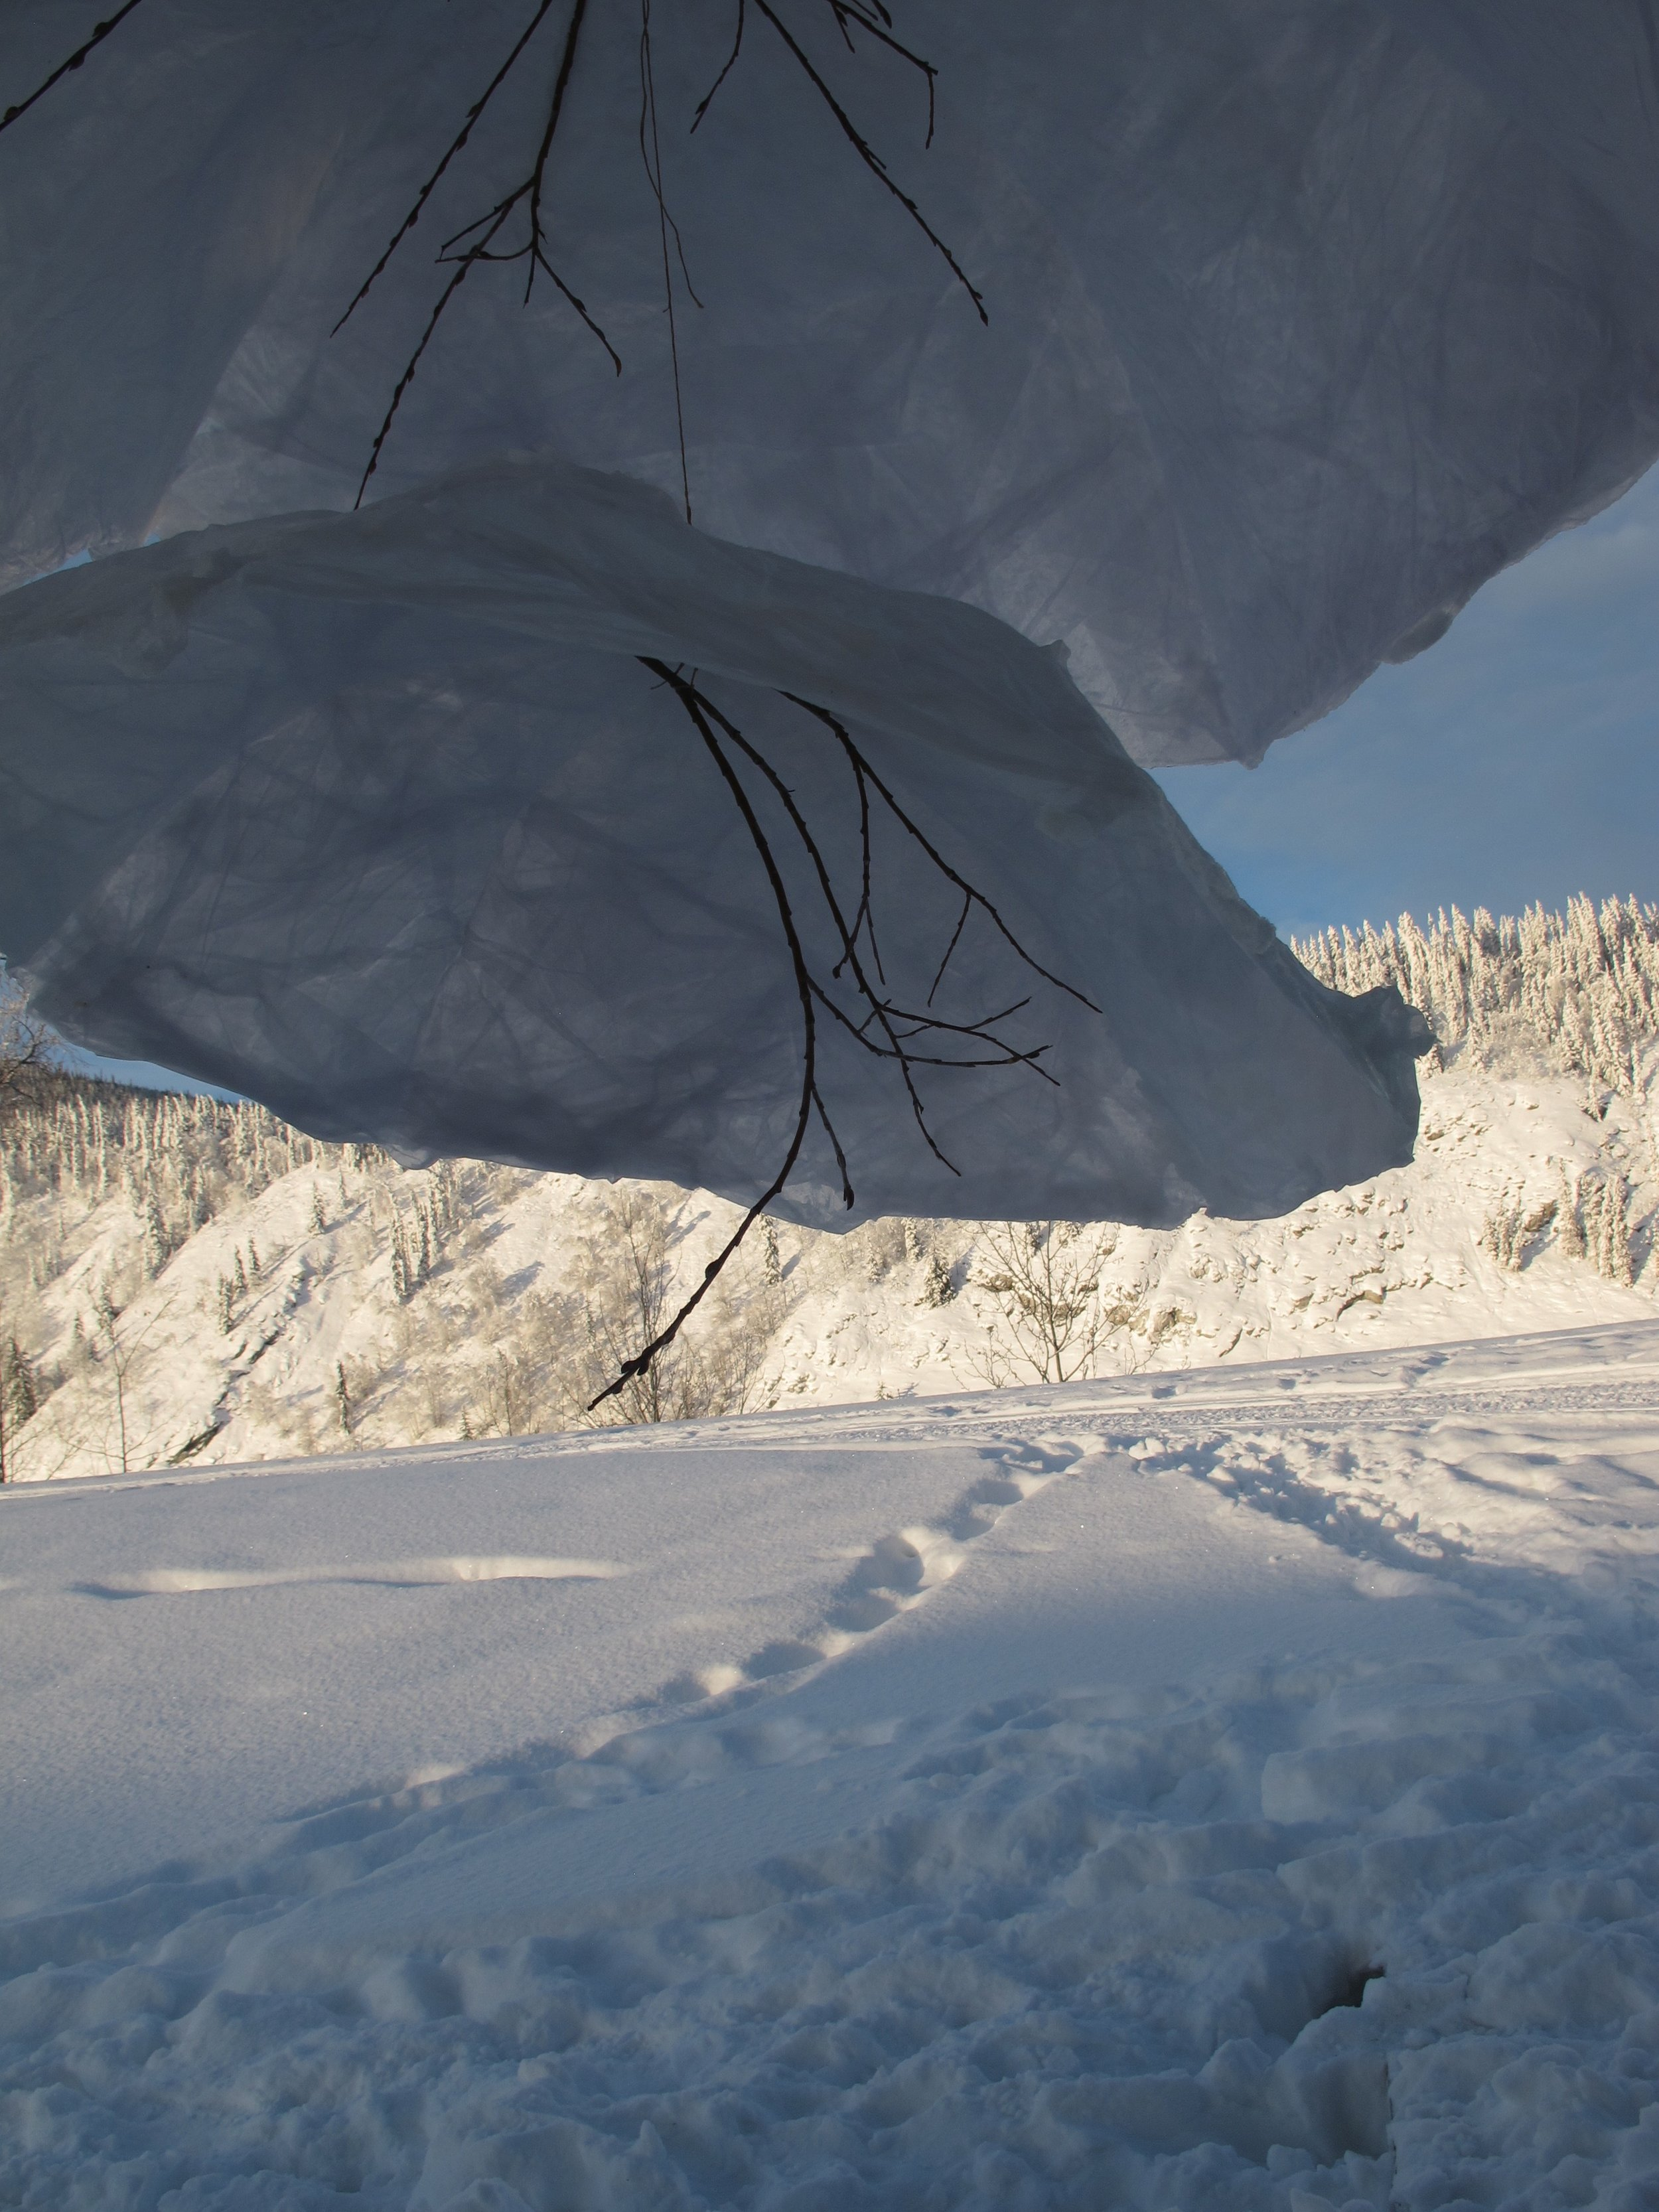 The snowy banks of the Yukon River, Dawson City, Yukon